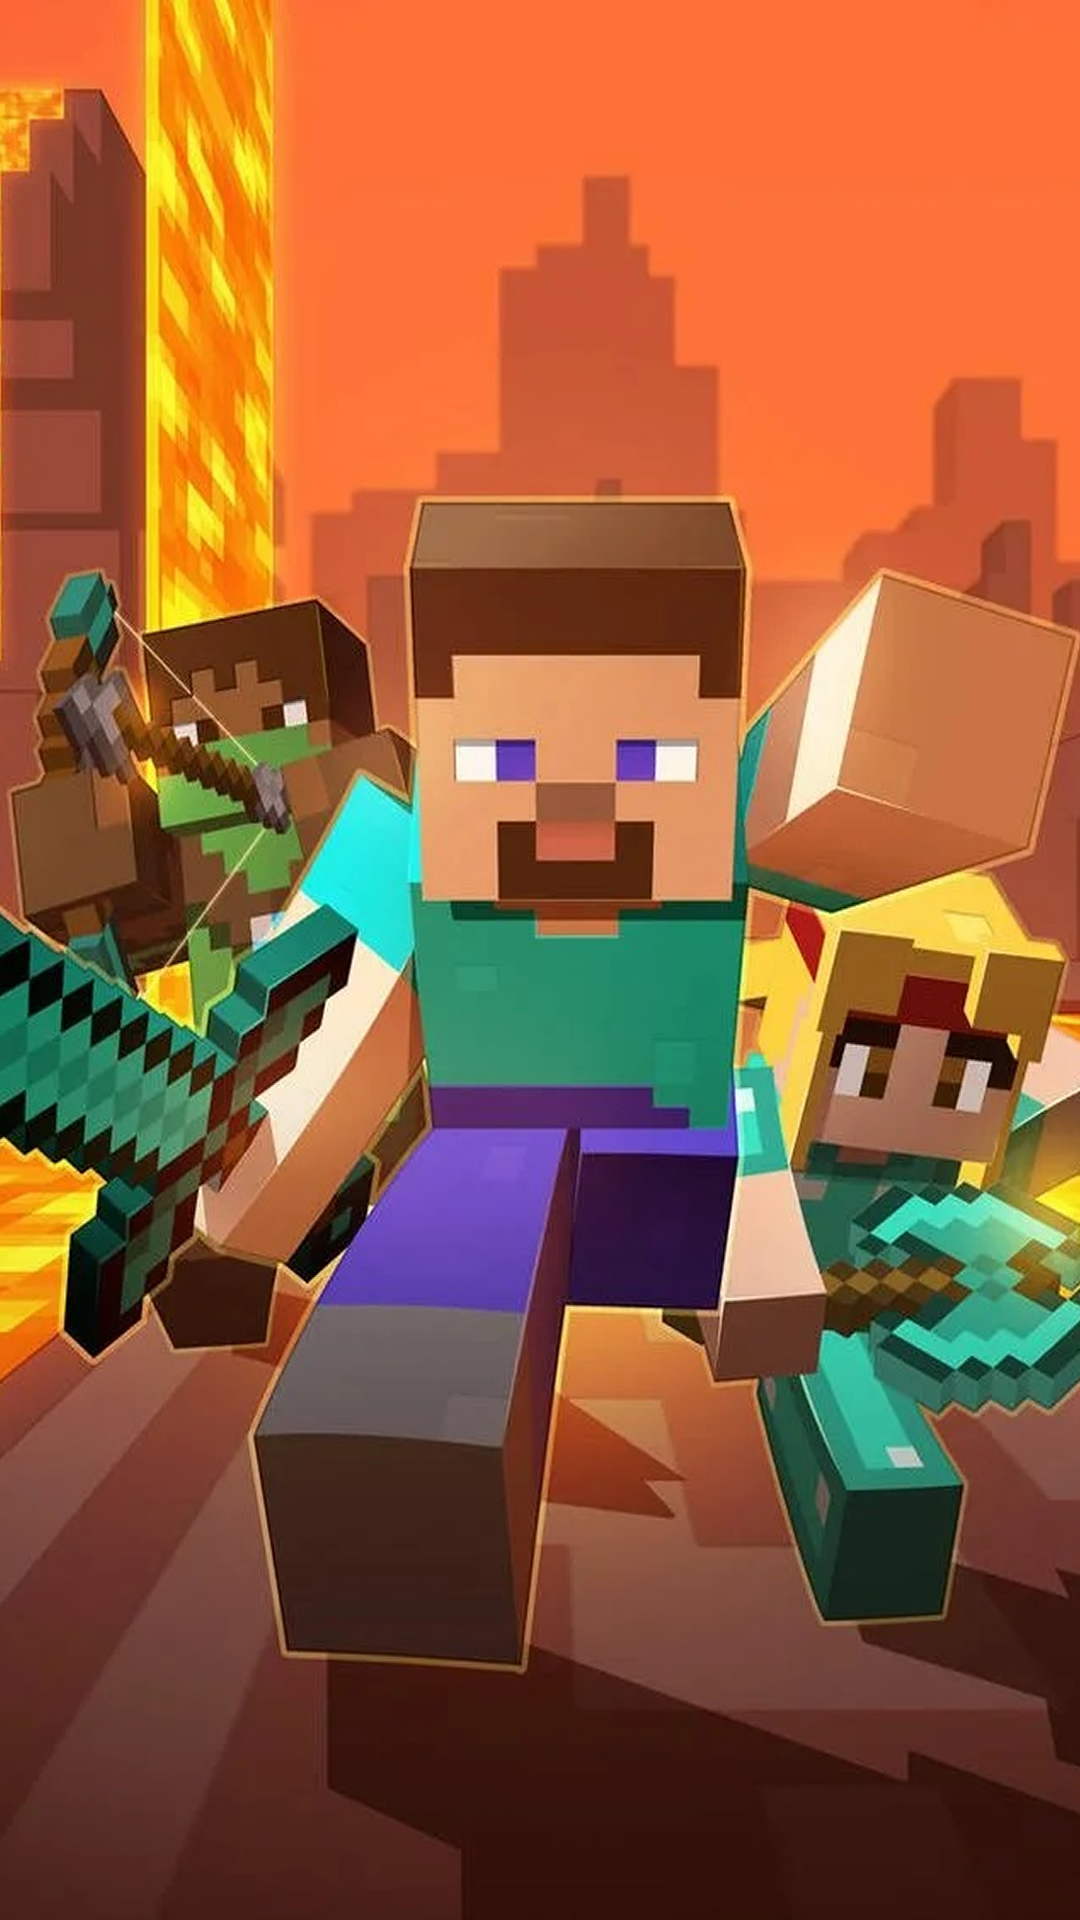 『Minecraft』マインクラフト 2021 スマホ壁紙